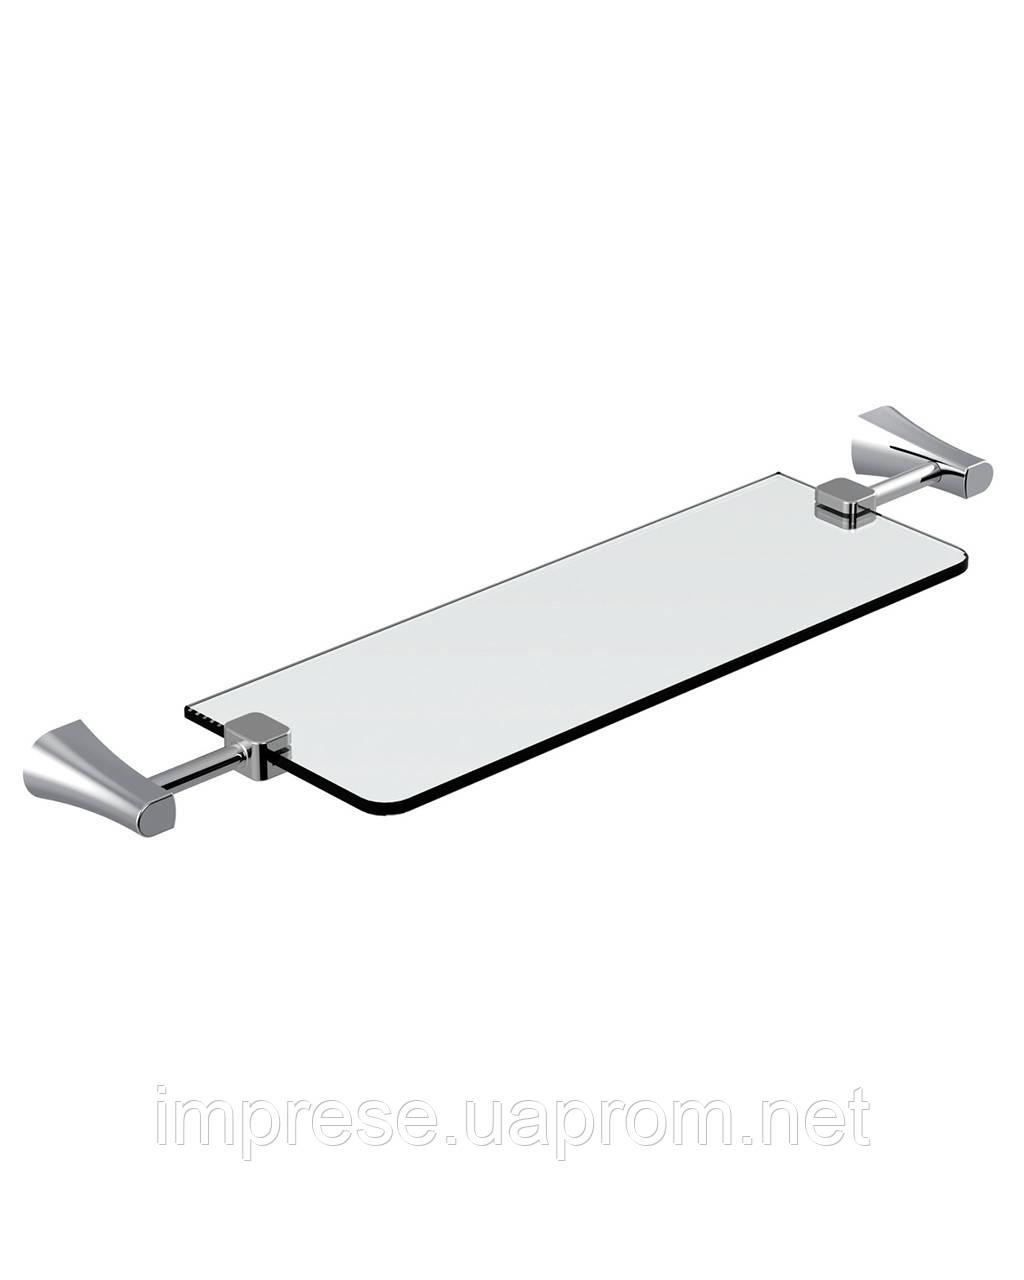 Полочка стеклянная Cuthna stribro 160280 stribro